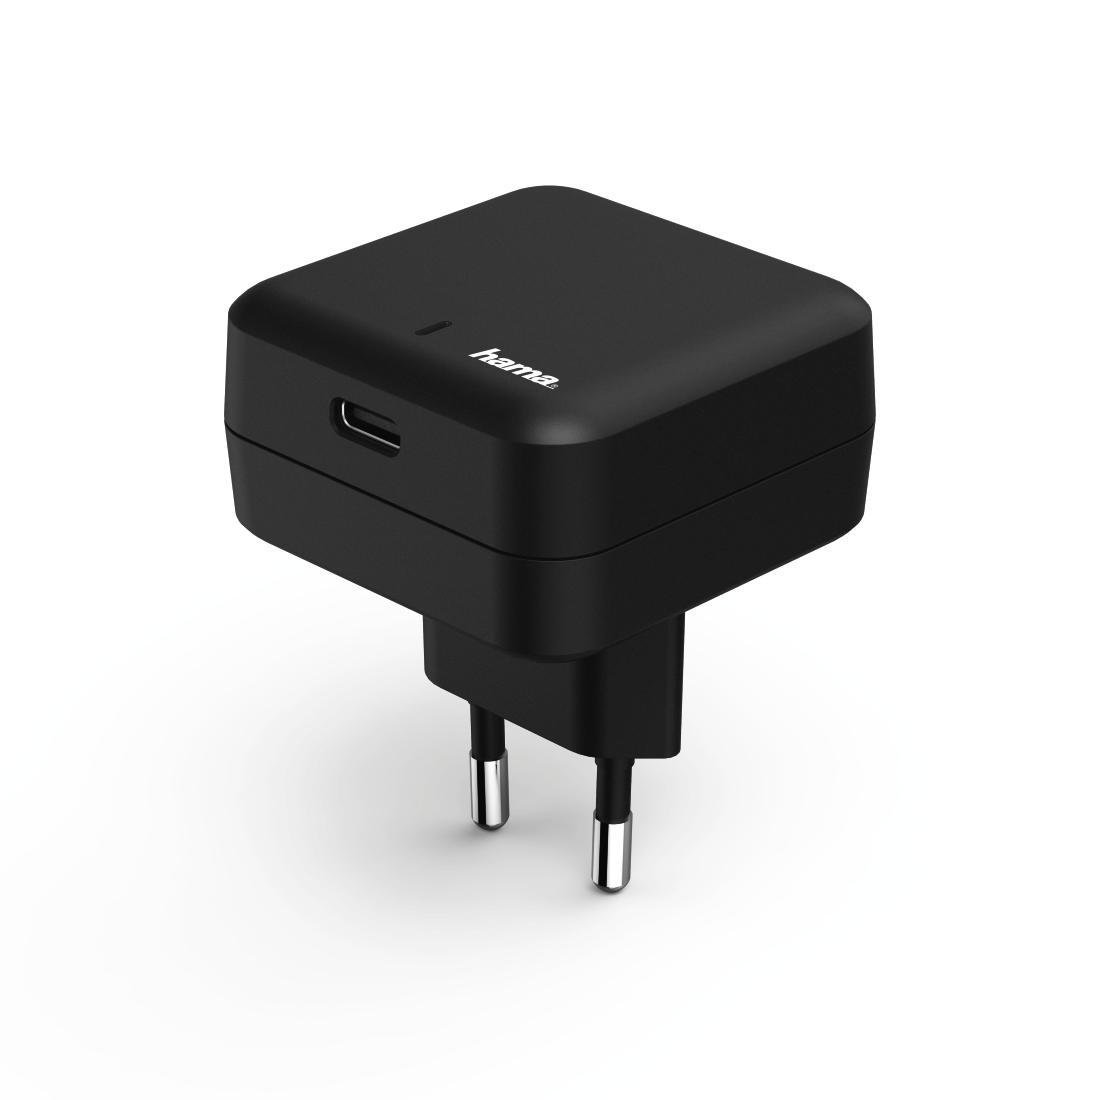 Сетевое зарядное устройство Hama 178312 Prime Line Black